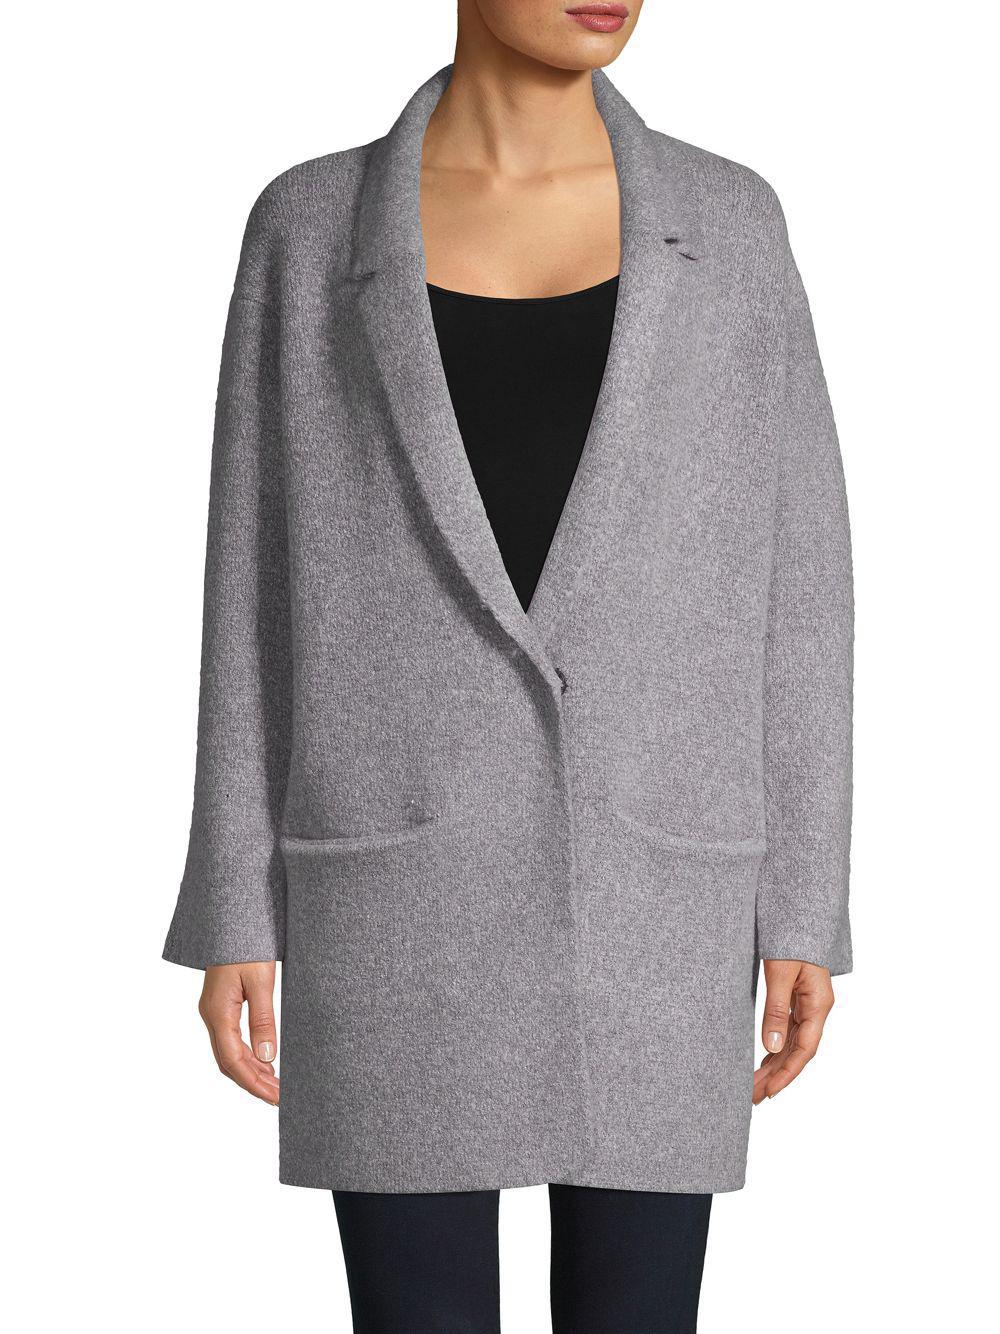 17d157bfb John + Jenn Oversize Sweater Coat in Gray - Lyst